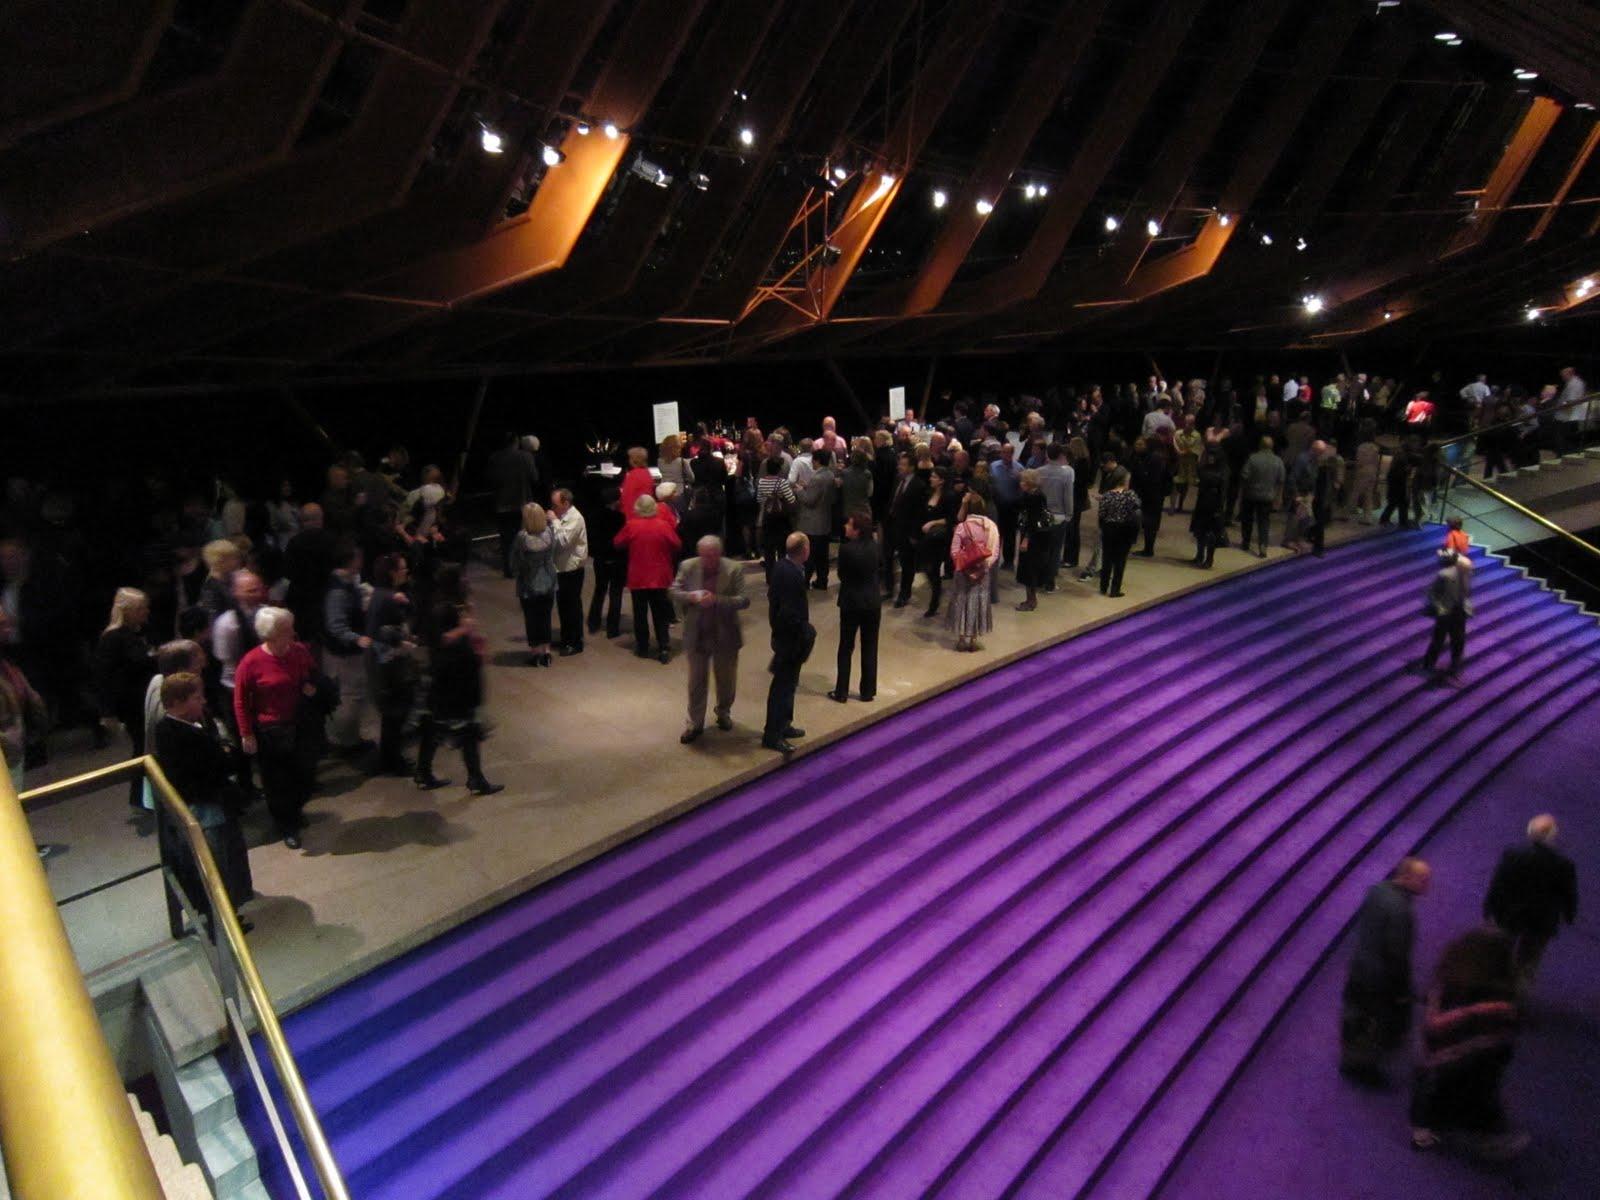 Sydney Opera House Northern Foyer : My ordinary life last night at the opera house